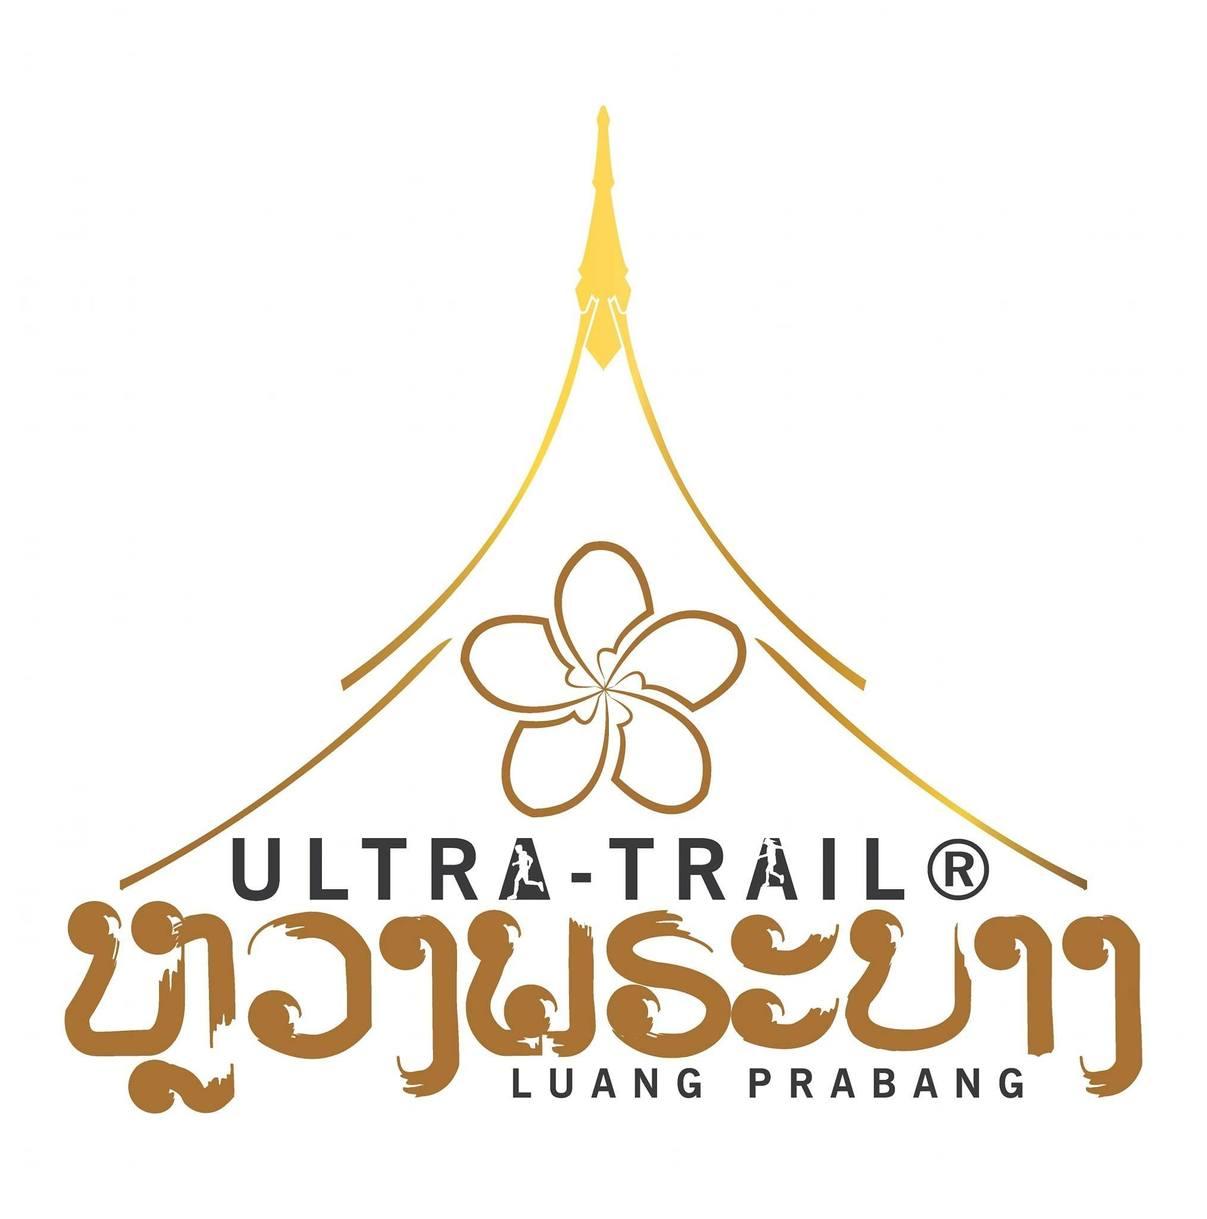 UTLP logo transpa.png